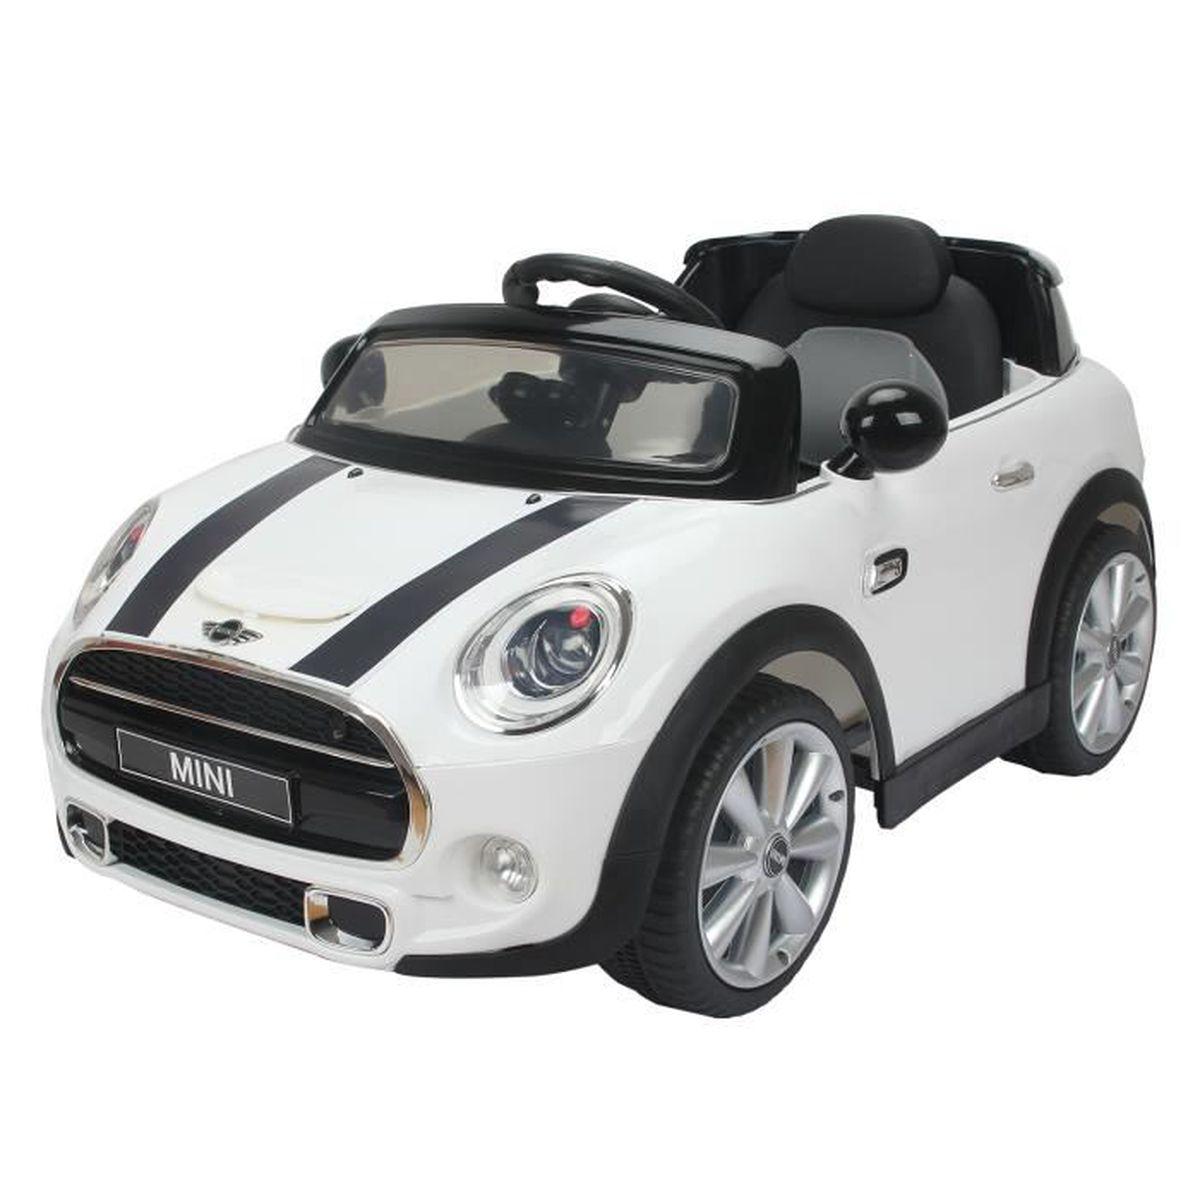 mini cooper voiture lectrique enfants partir de 37 mois 2 moteurs 6 v 2 5 5 km h phares. Black Bedroom Furniture Sets. Home Design Ideas